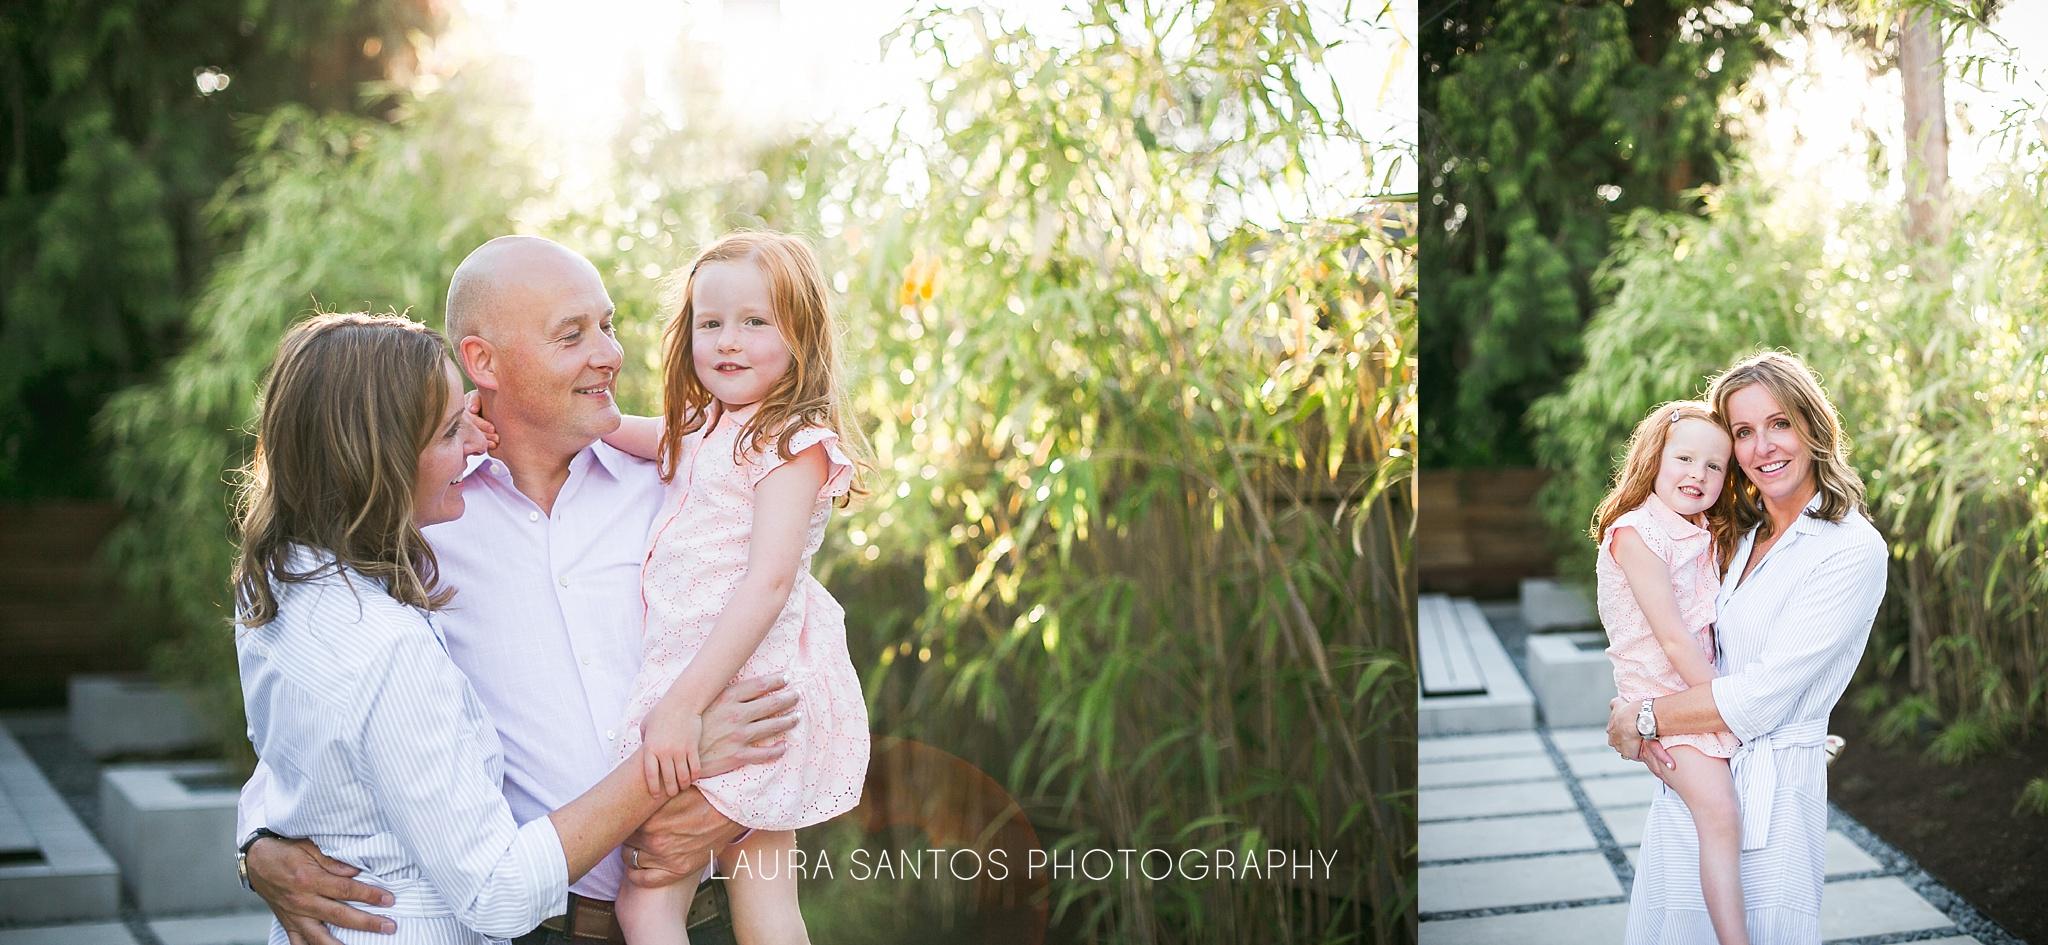 Laura Santos Photography Portland Oregon Family Photographer_0013.jpg